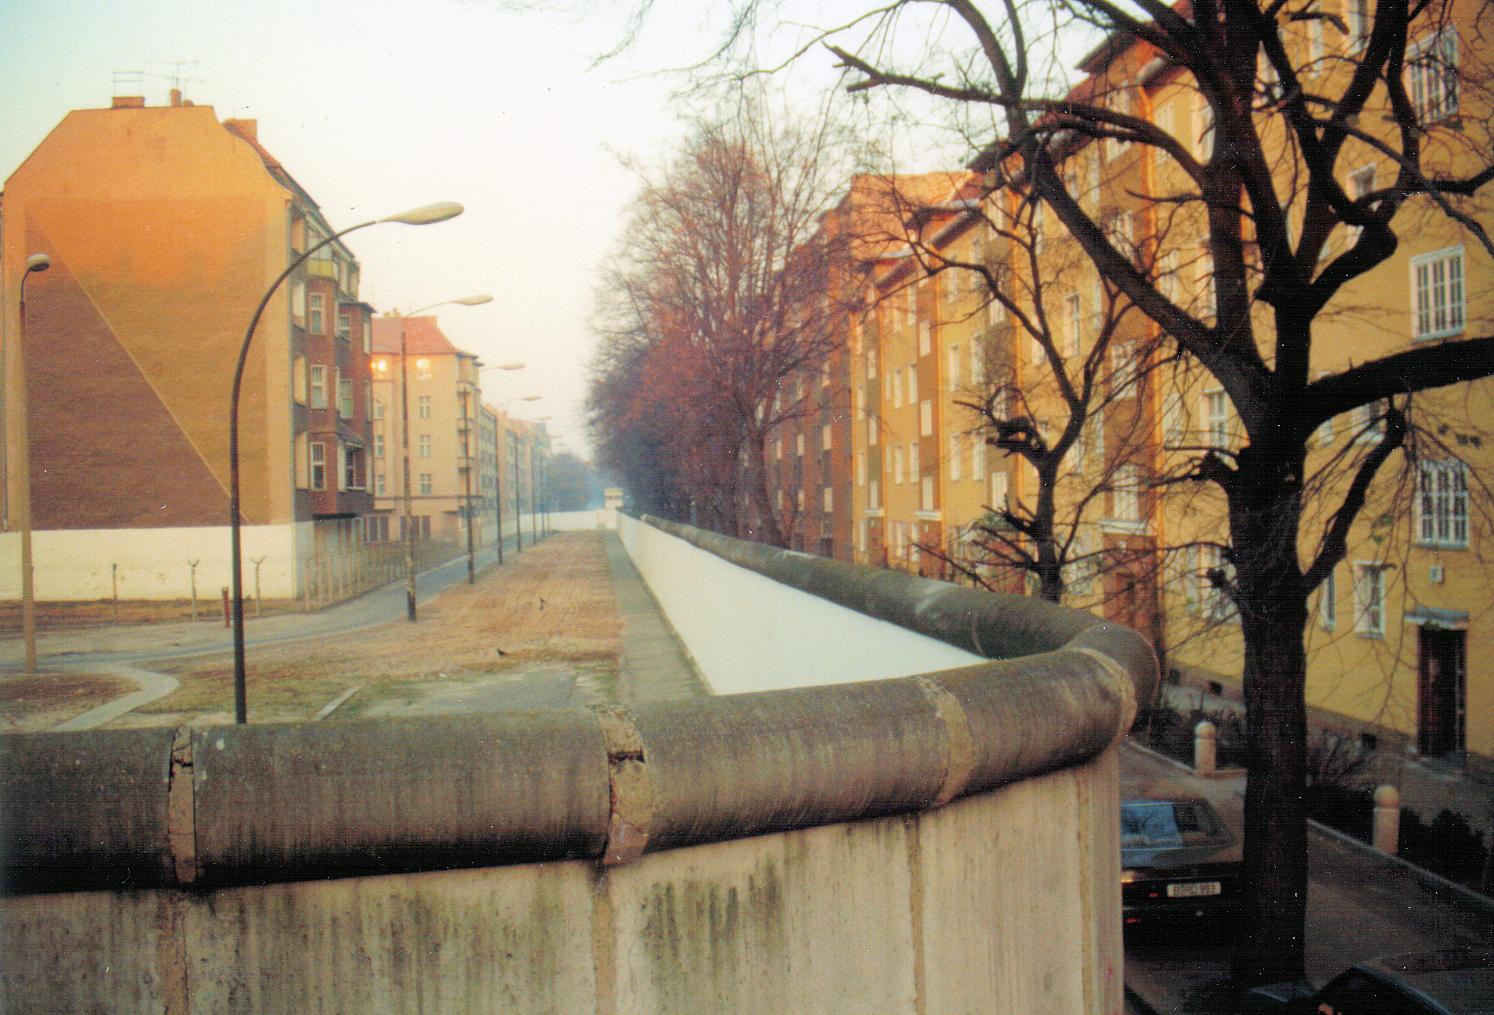 Datei:Bouchéstraße-Harzer Straße - Berliner Mauer, 1989-11-18.png